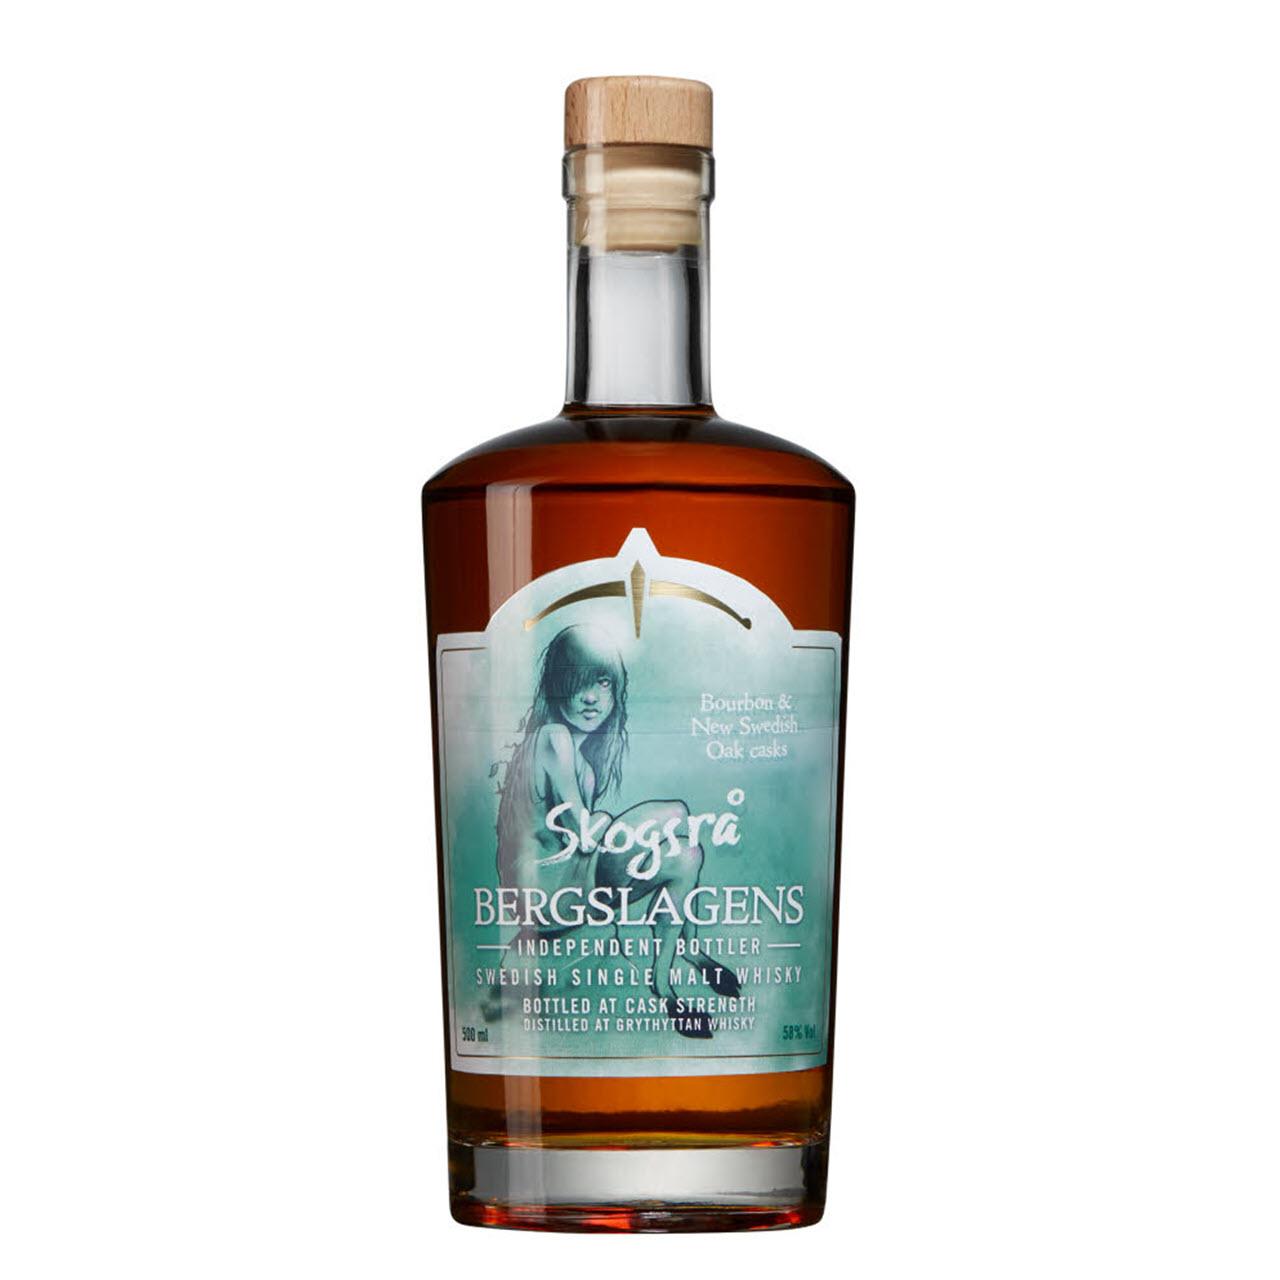 Nordic Whisky #194 - Grythyttan Skogsrå